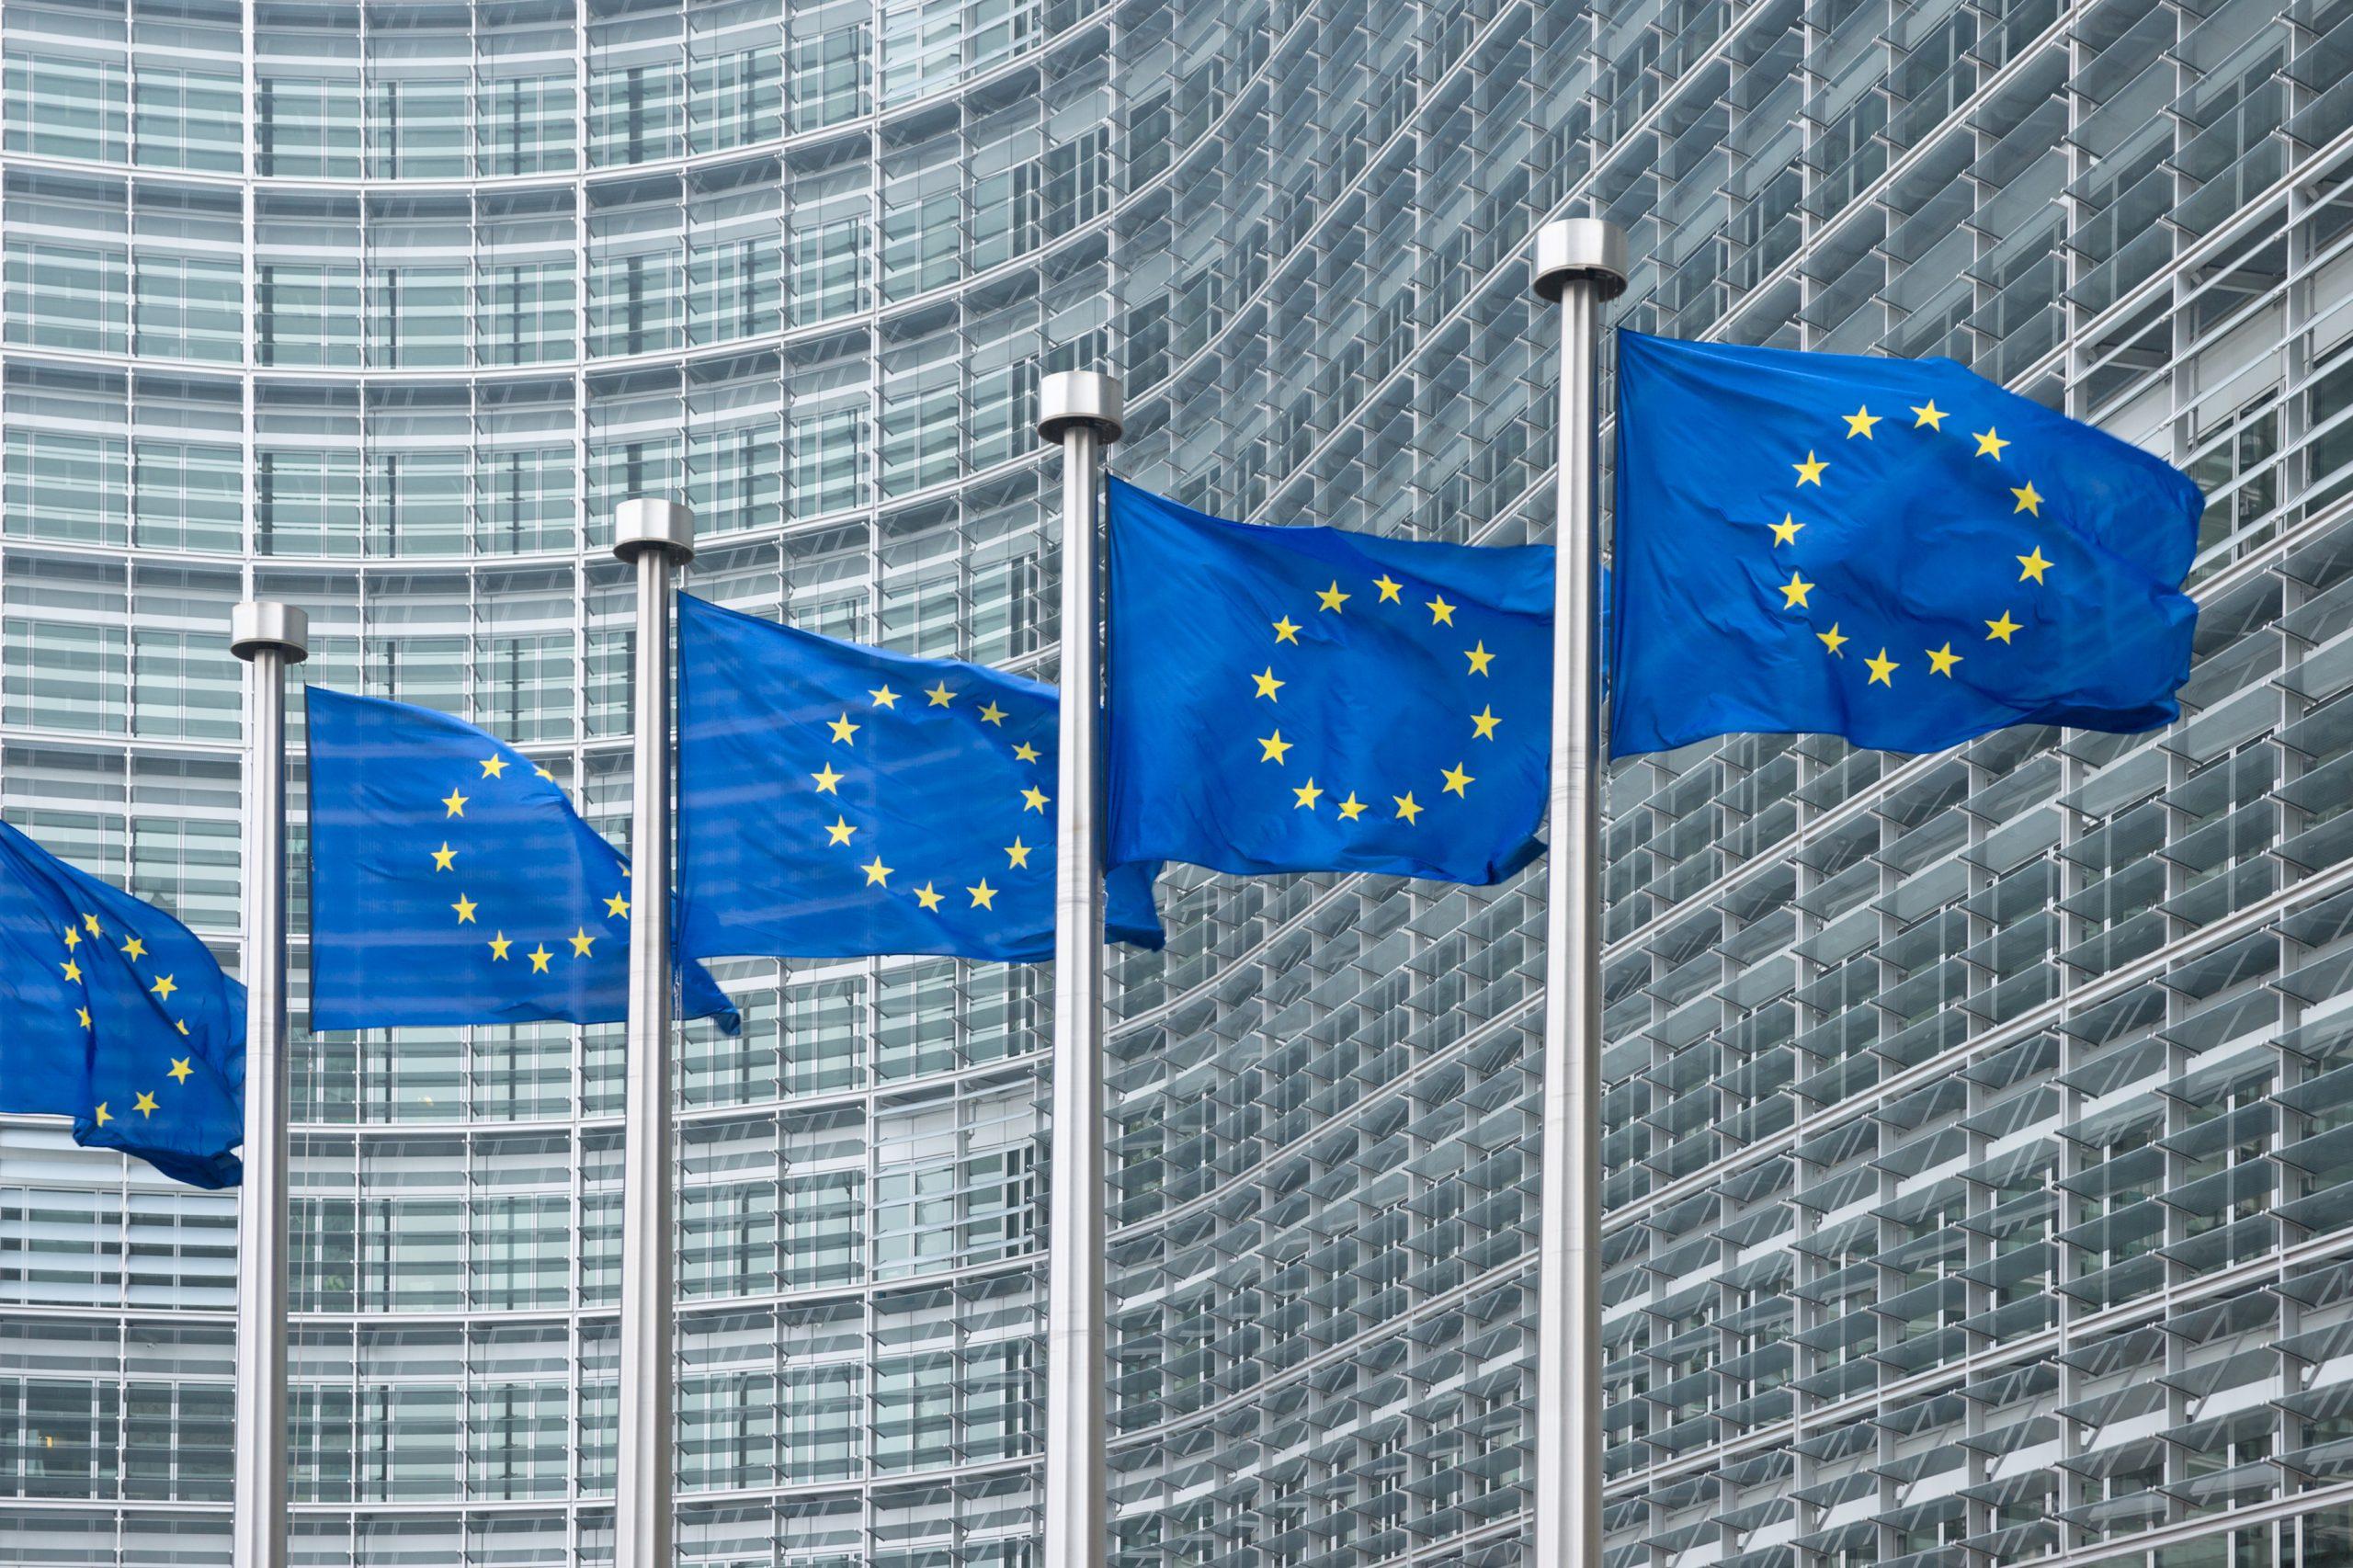 European Citizens' Initiative for Basic Income